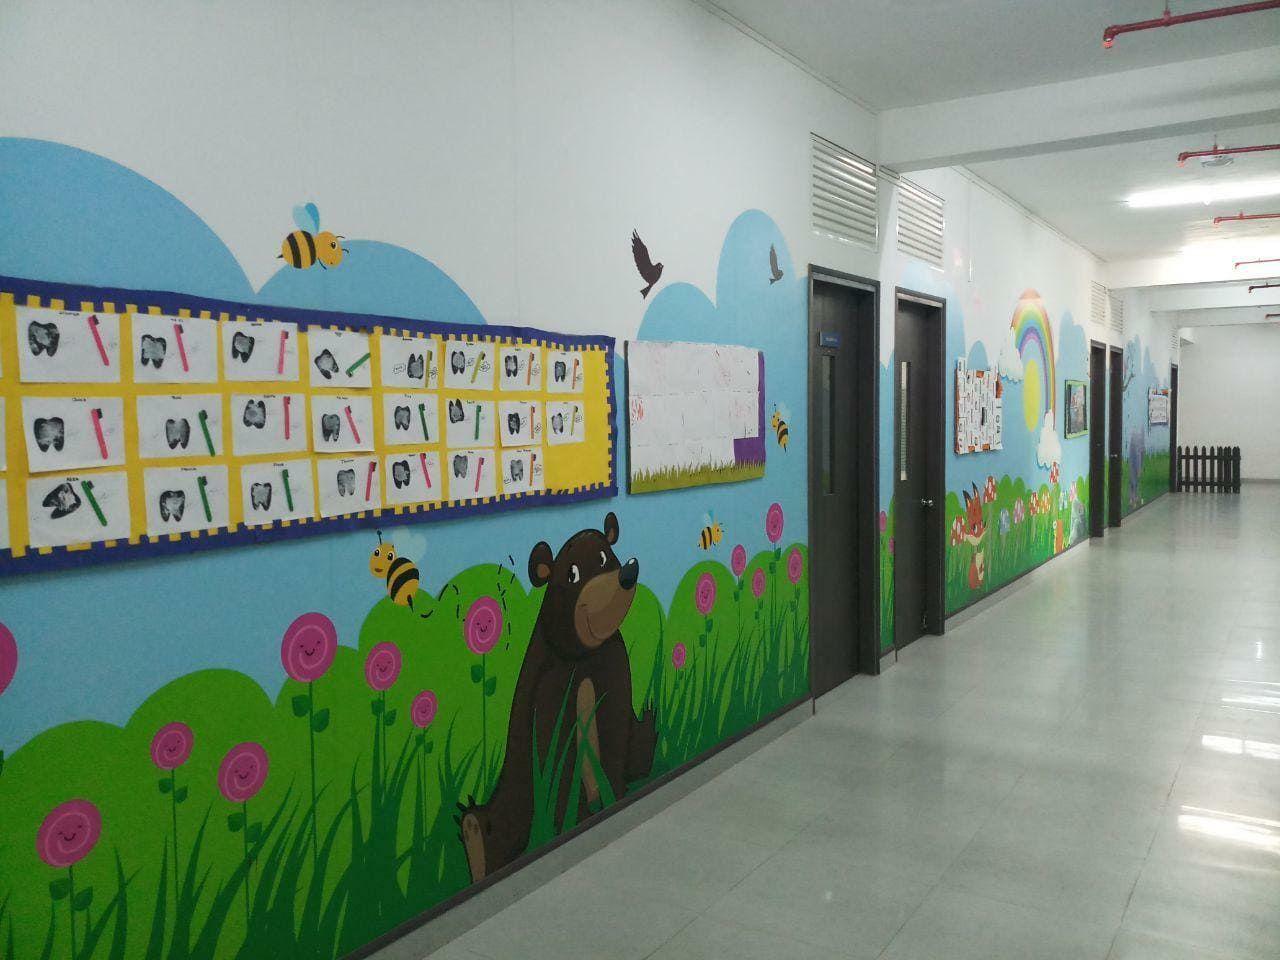 School Graphics Internal Branding School Wall Graphics Graphic